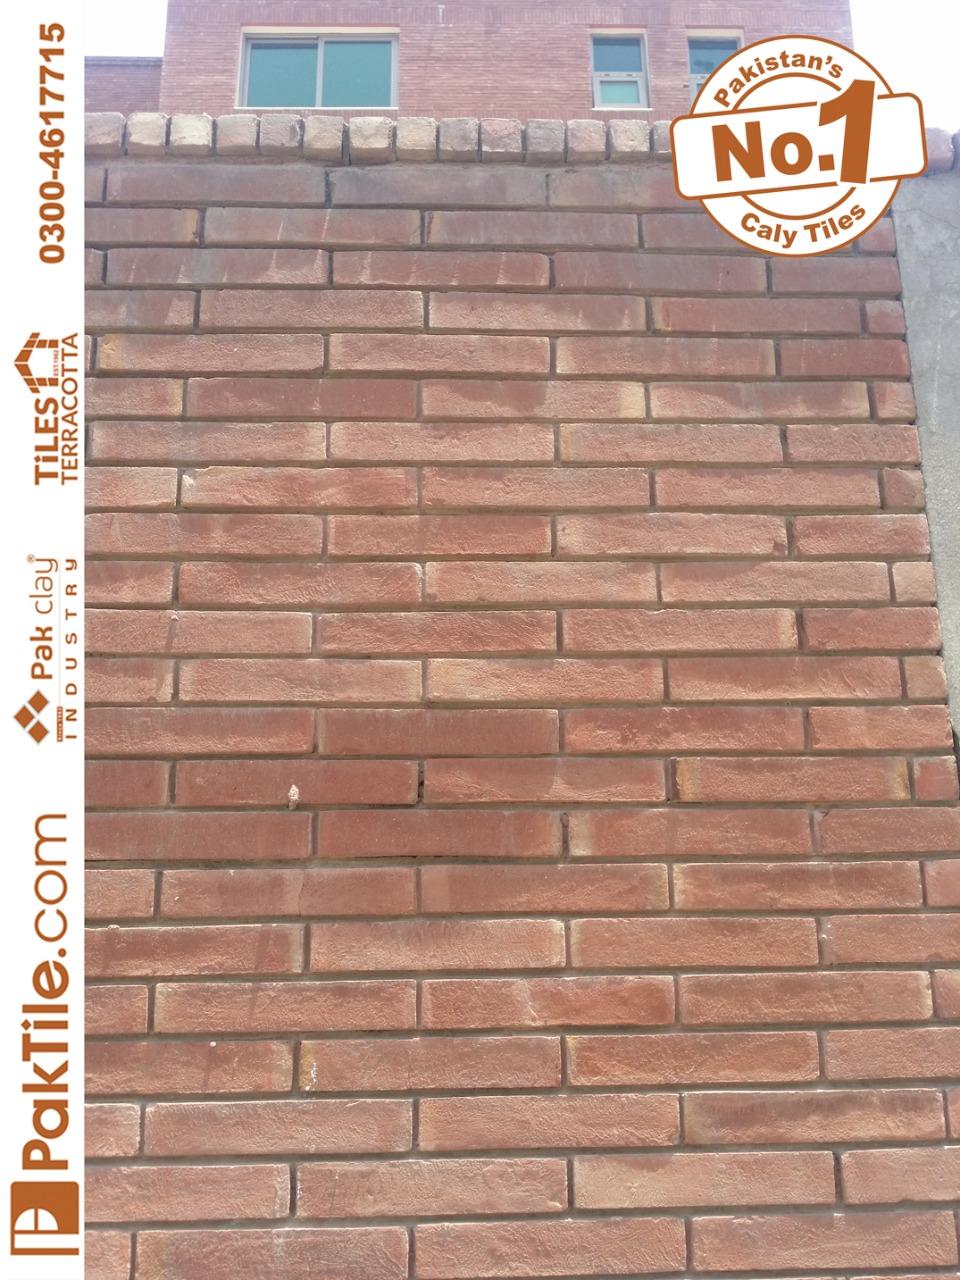 red face bricks islamabad